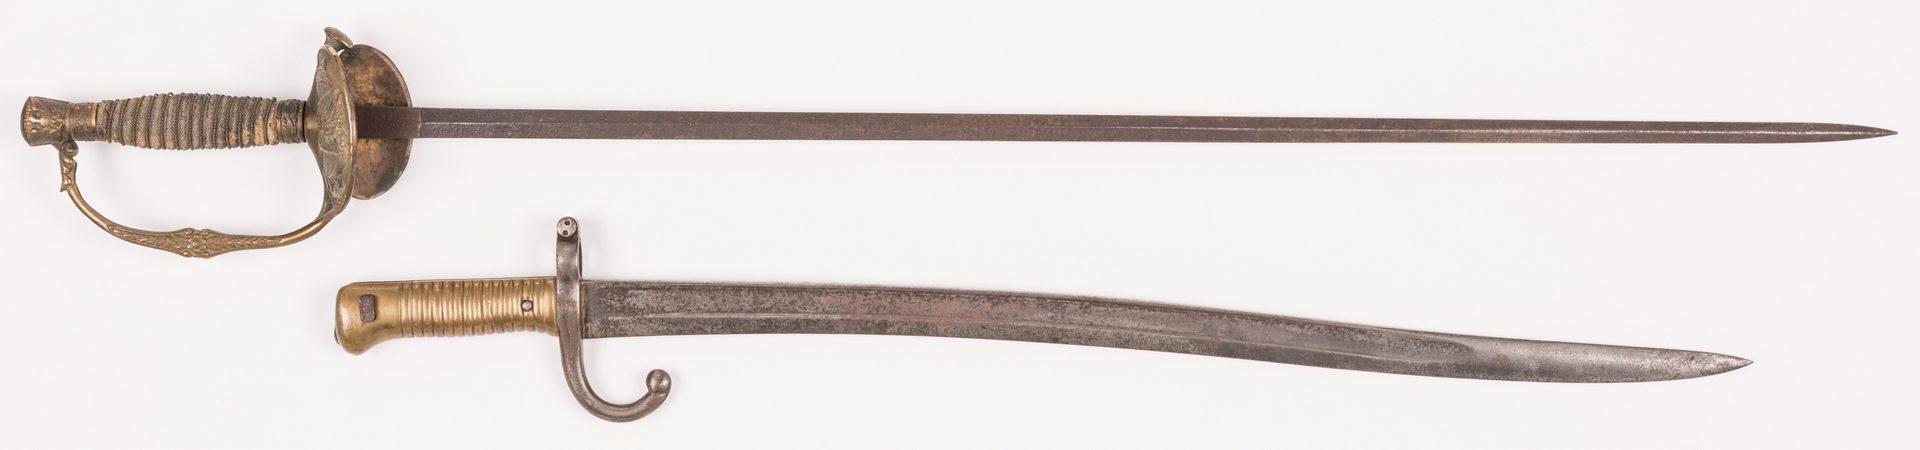 Lot 212: US Model 1860 Sword & French Saber Bayonet